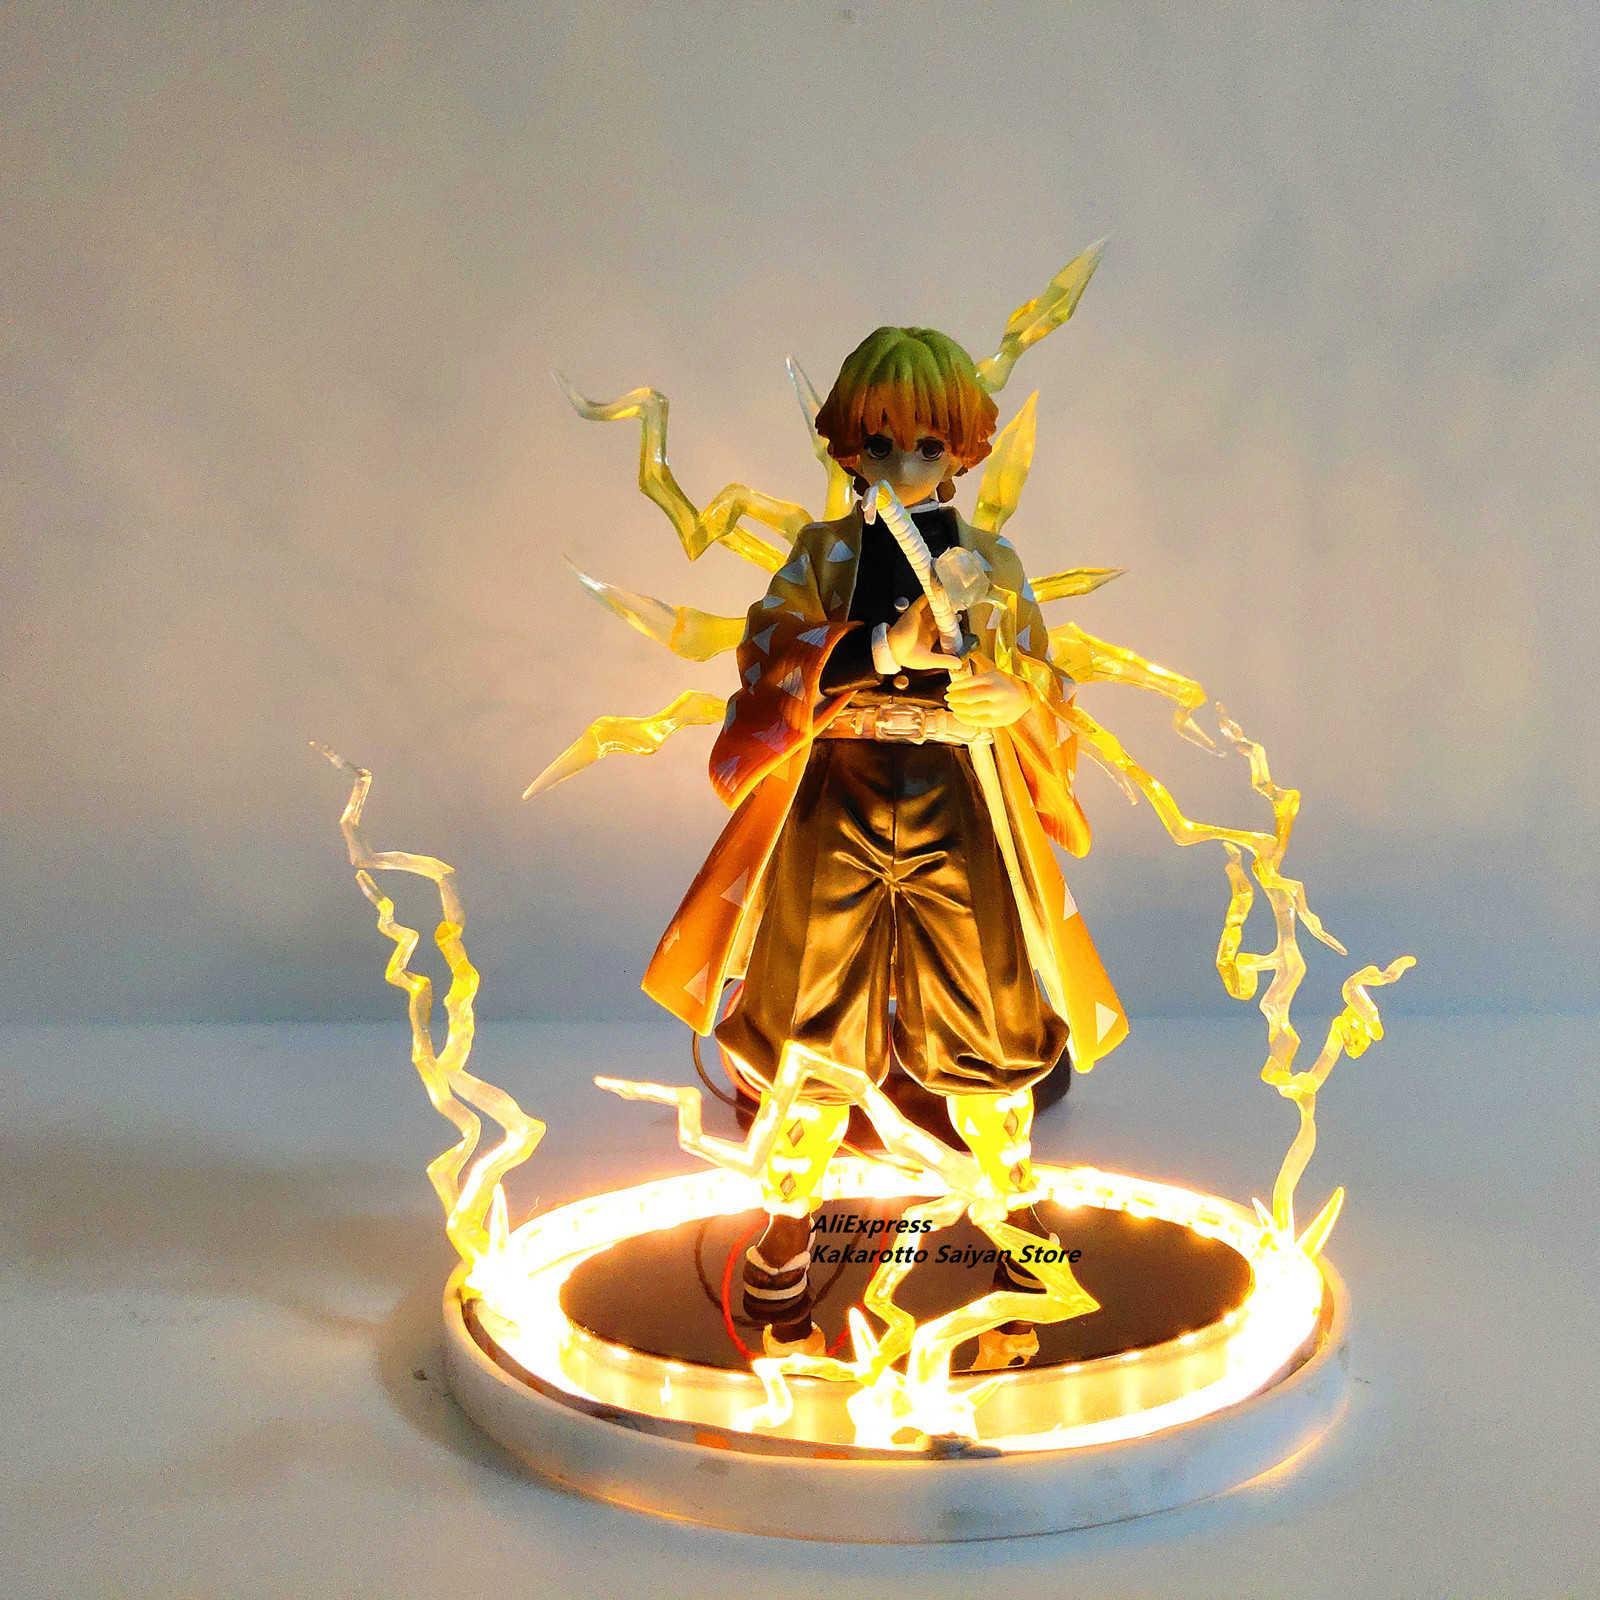 Slayer Demon Agatsuma ZENITSU PVC Action Figures ThunderClap и Flash Effects Anime Kimetsu No Yaiba модельные игрушки 201202